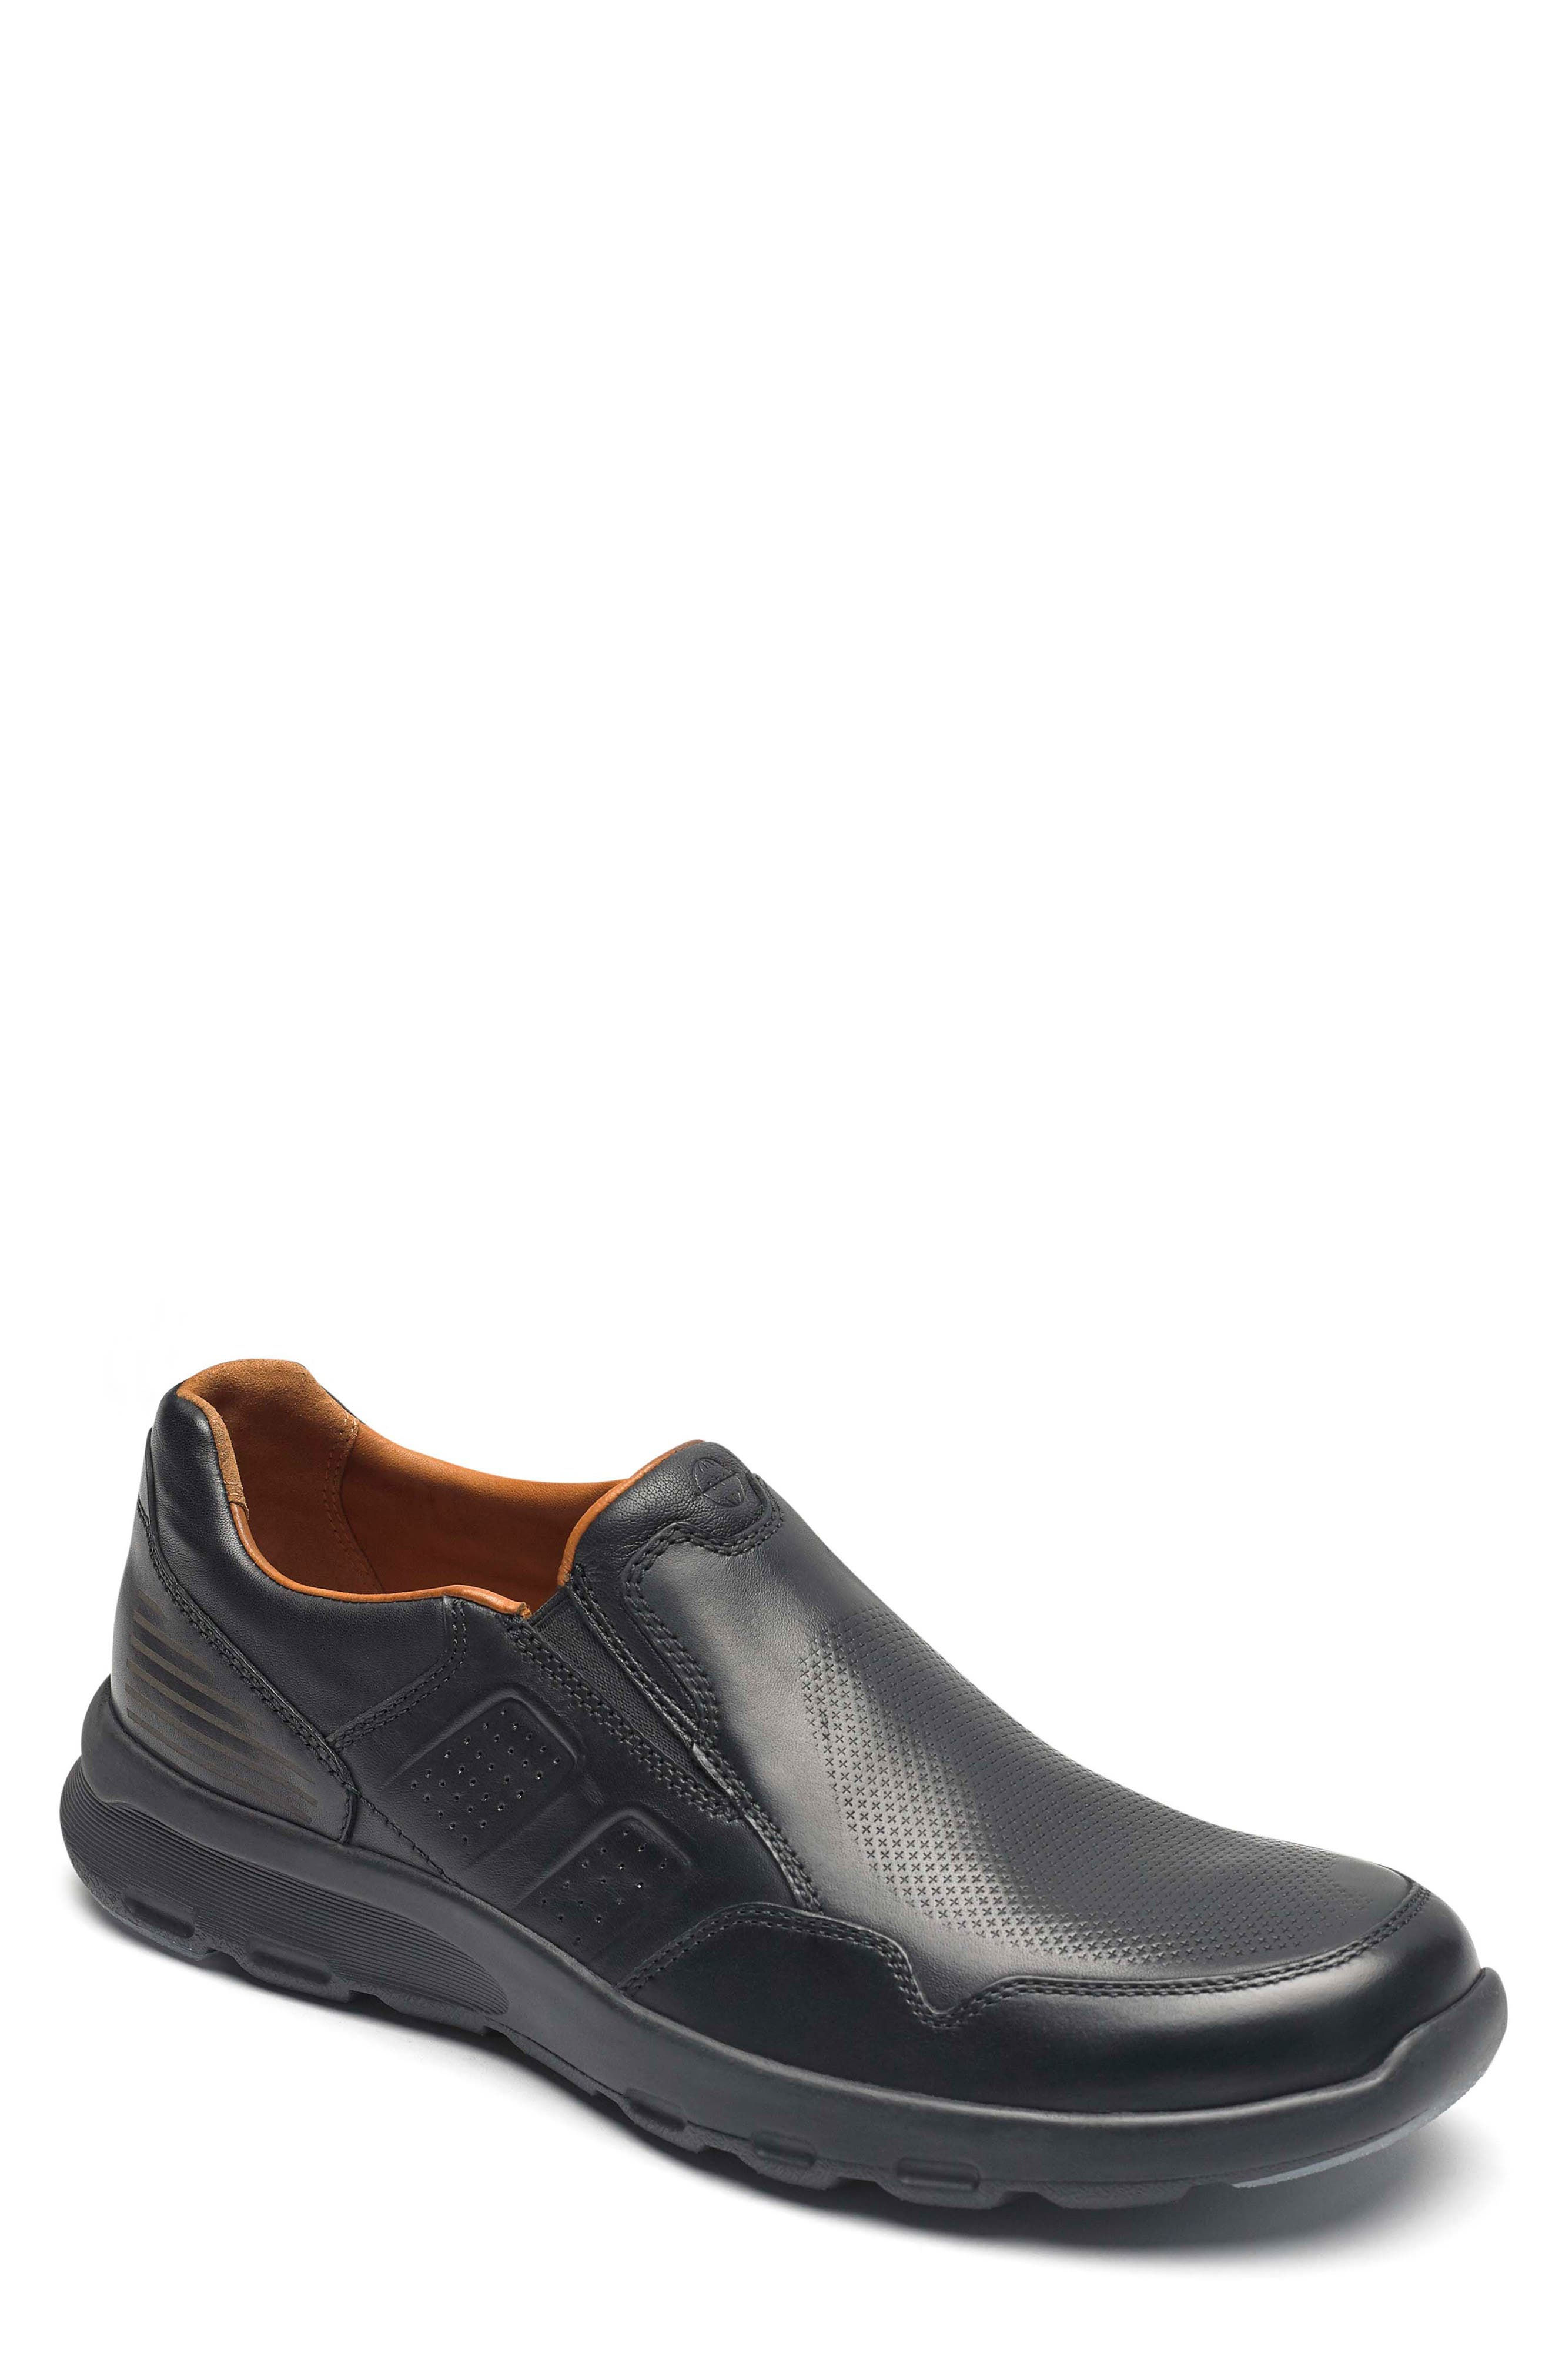 Let's Walk<sup>®</sup> Venetian Loafer,                         Main,                         color, BLACK LEATHER